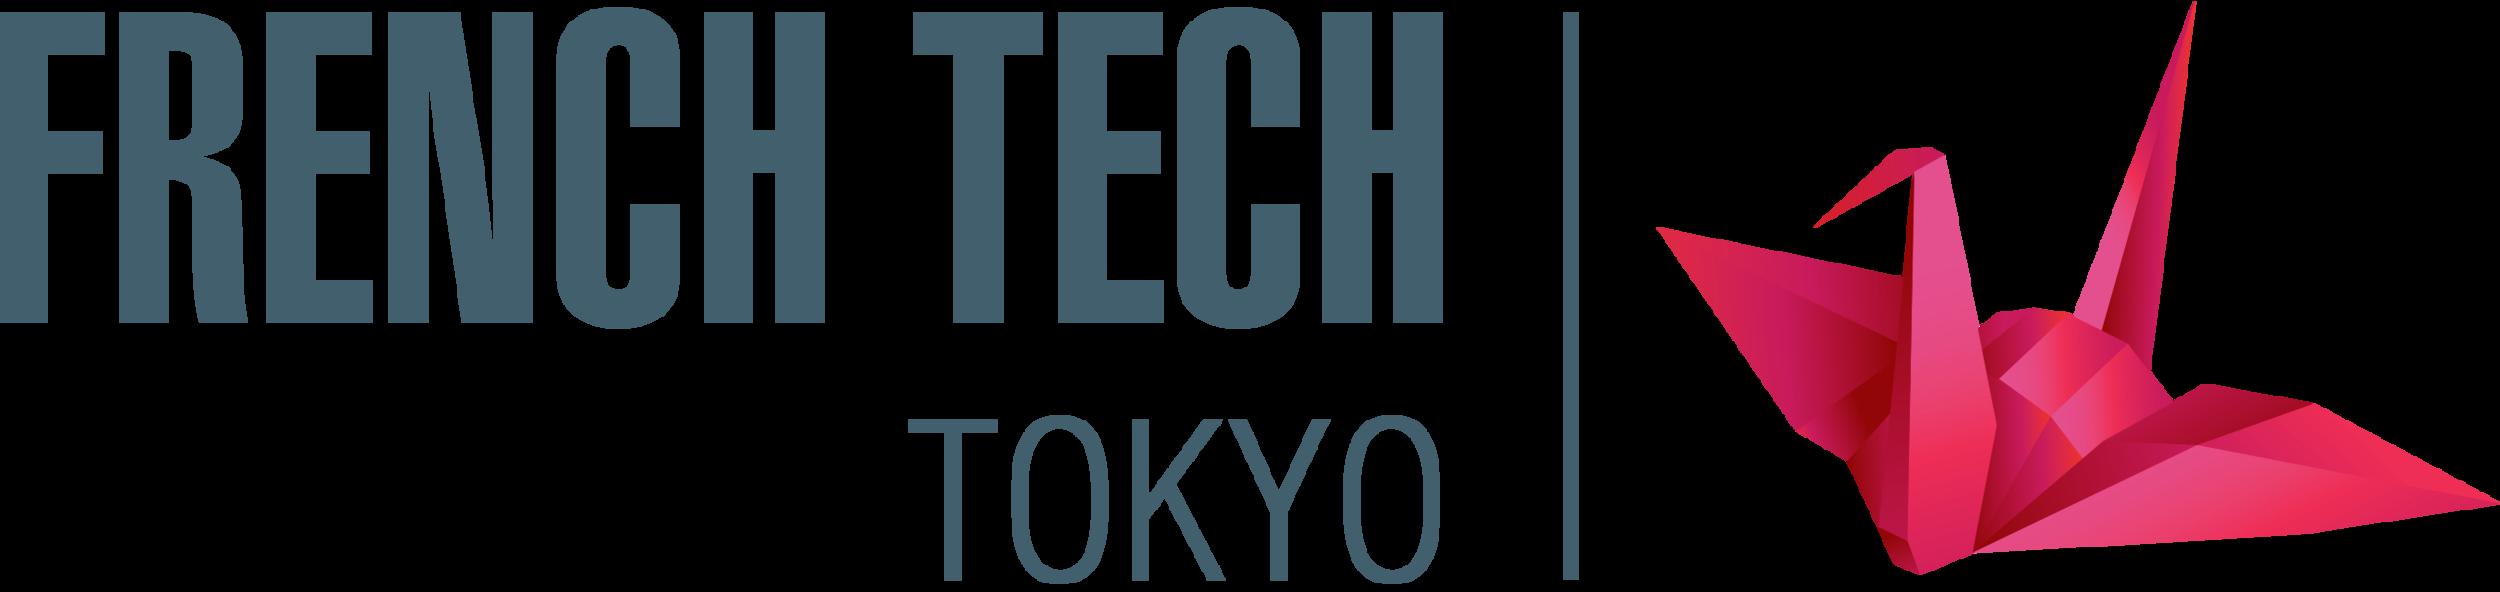 FT_Tokyo-logo.png